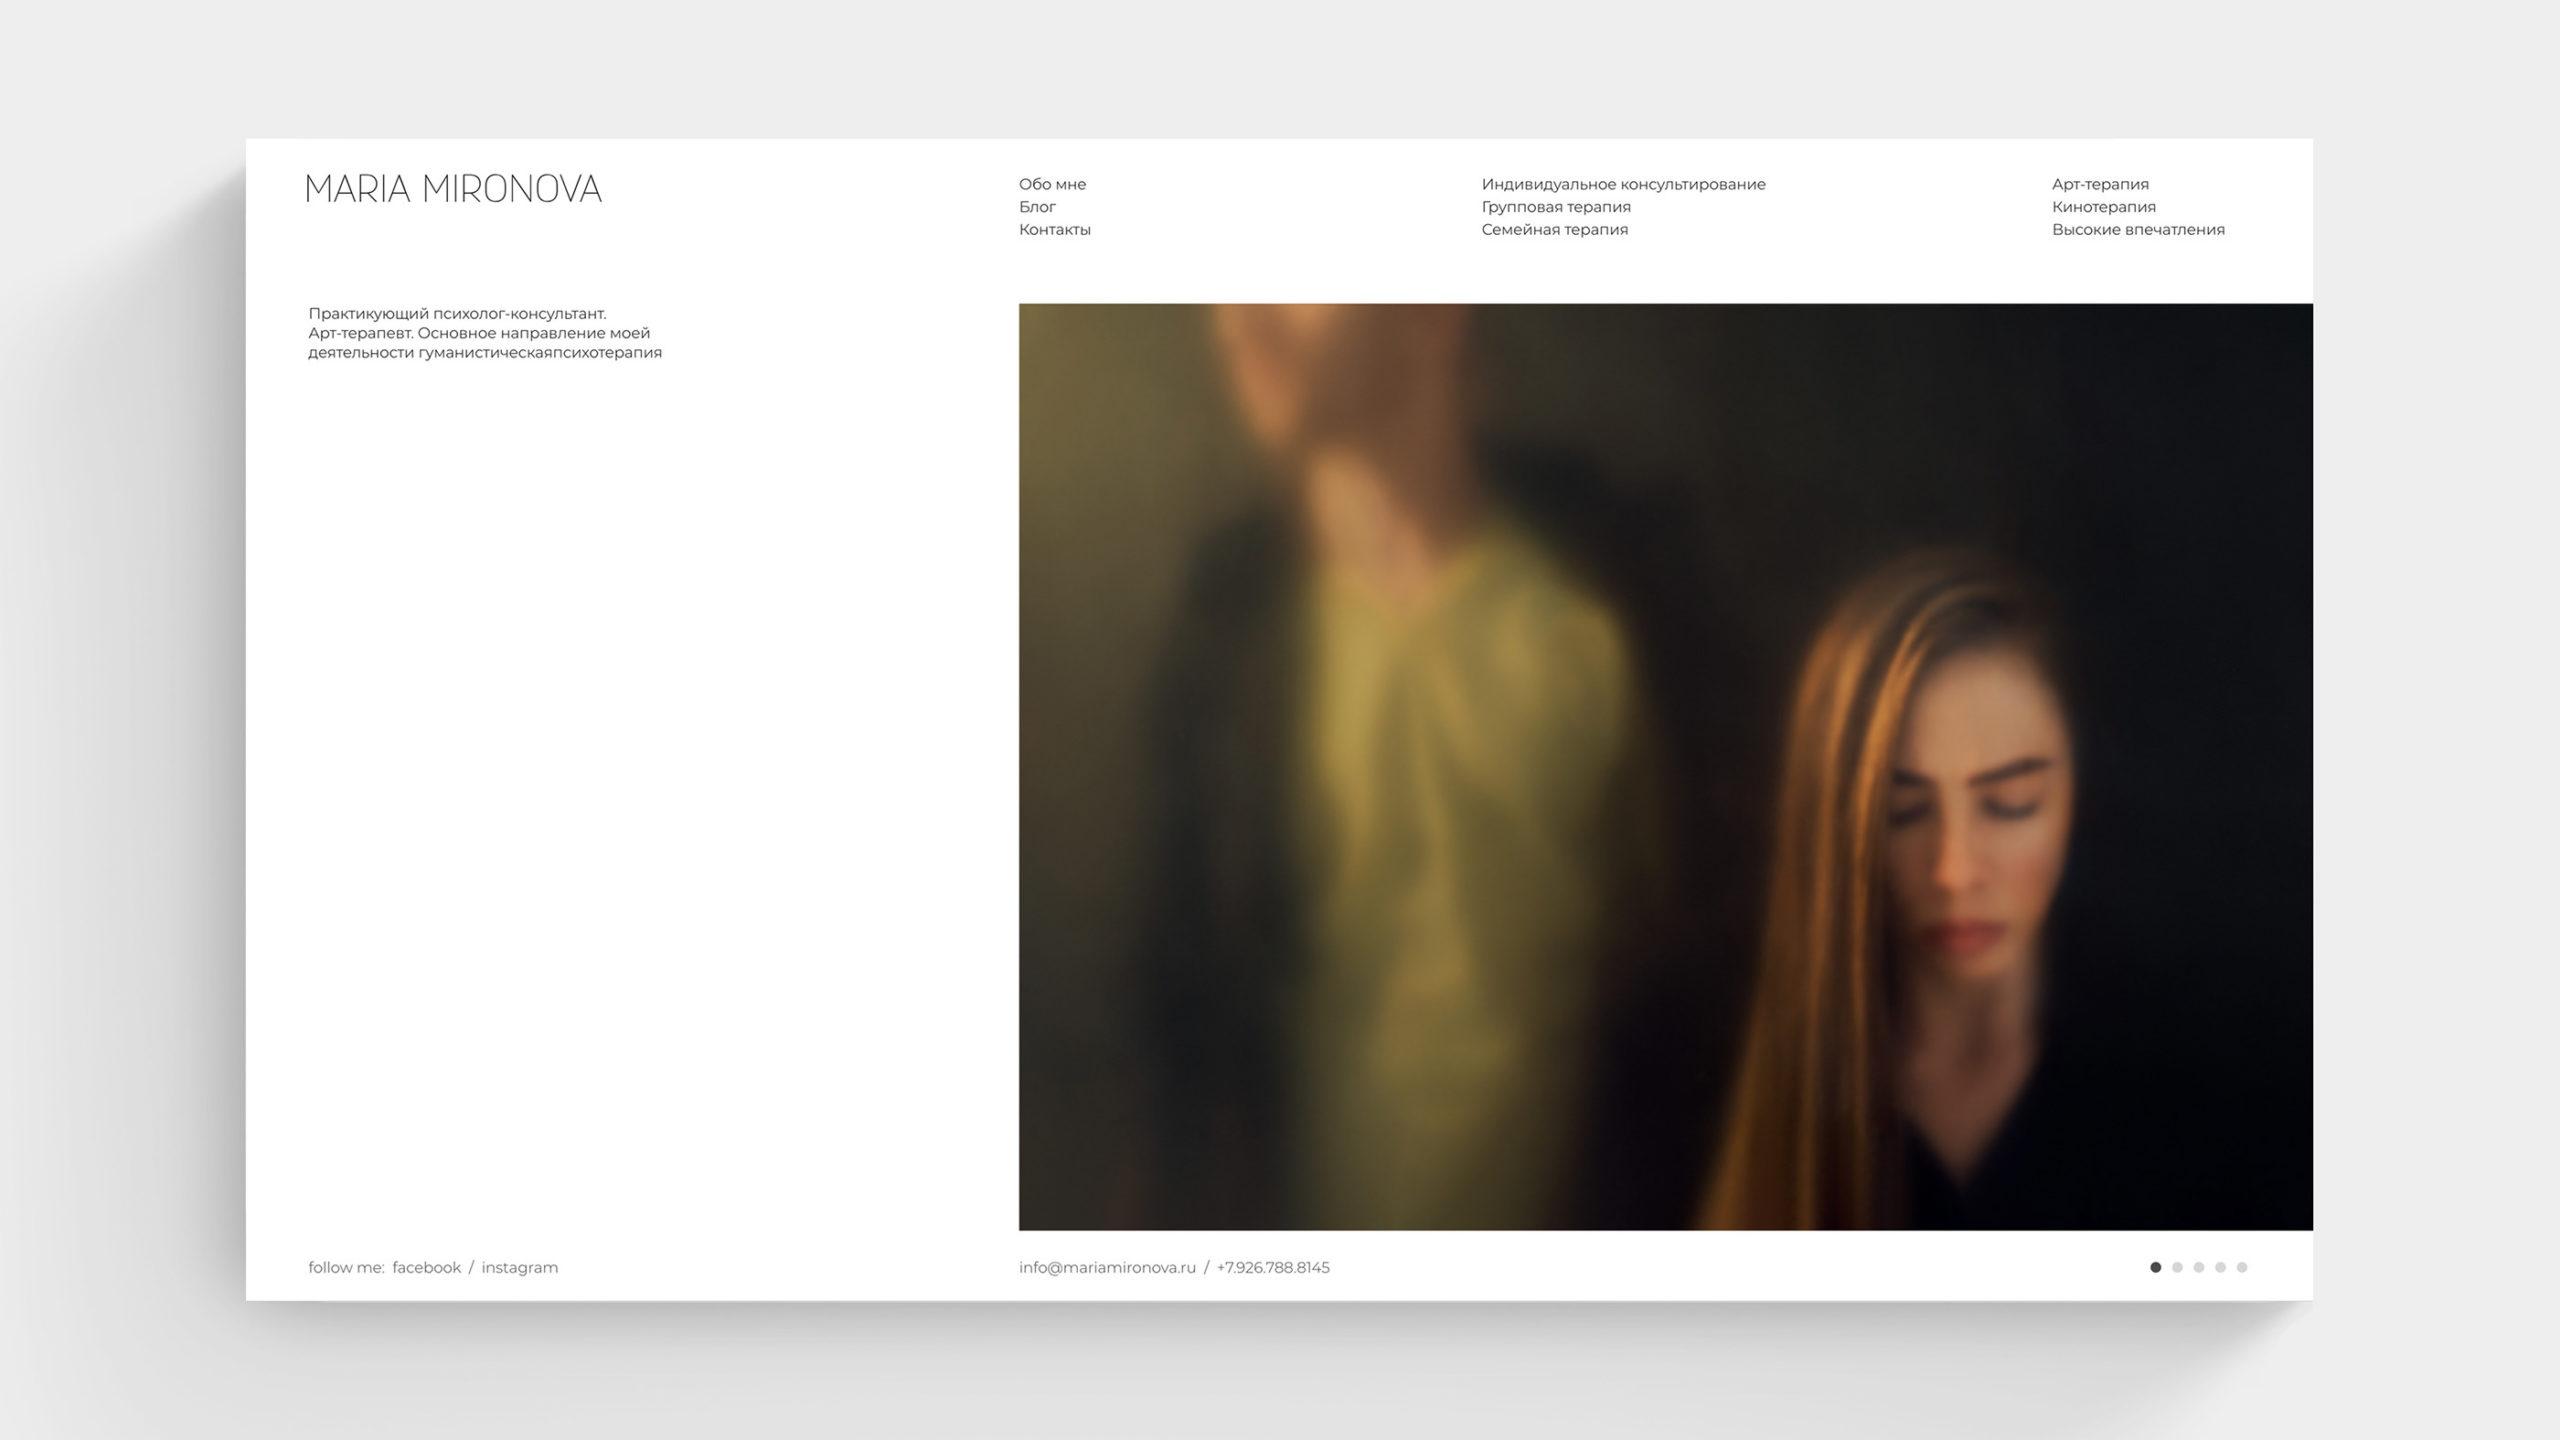 maria mironova, web design